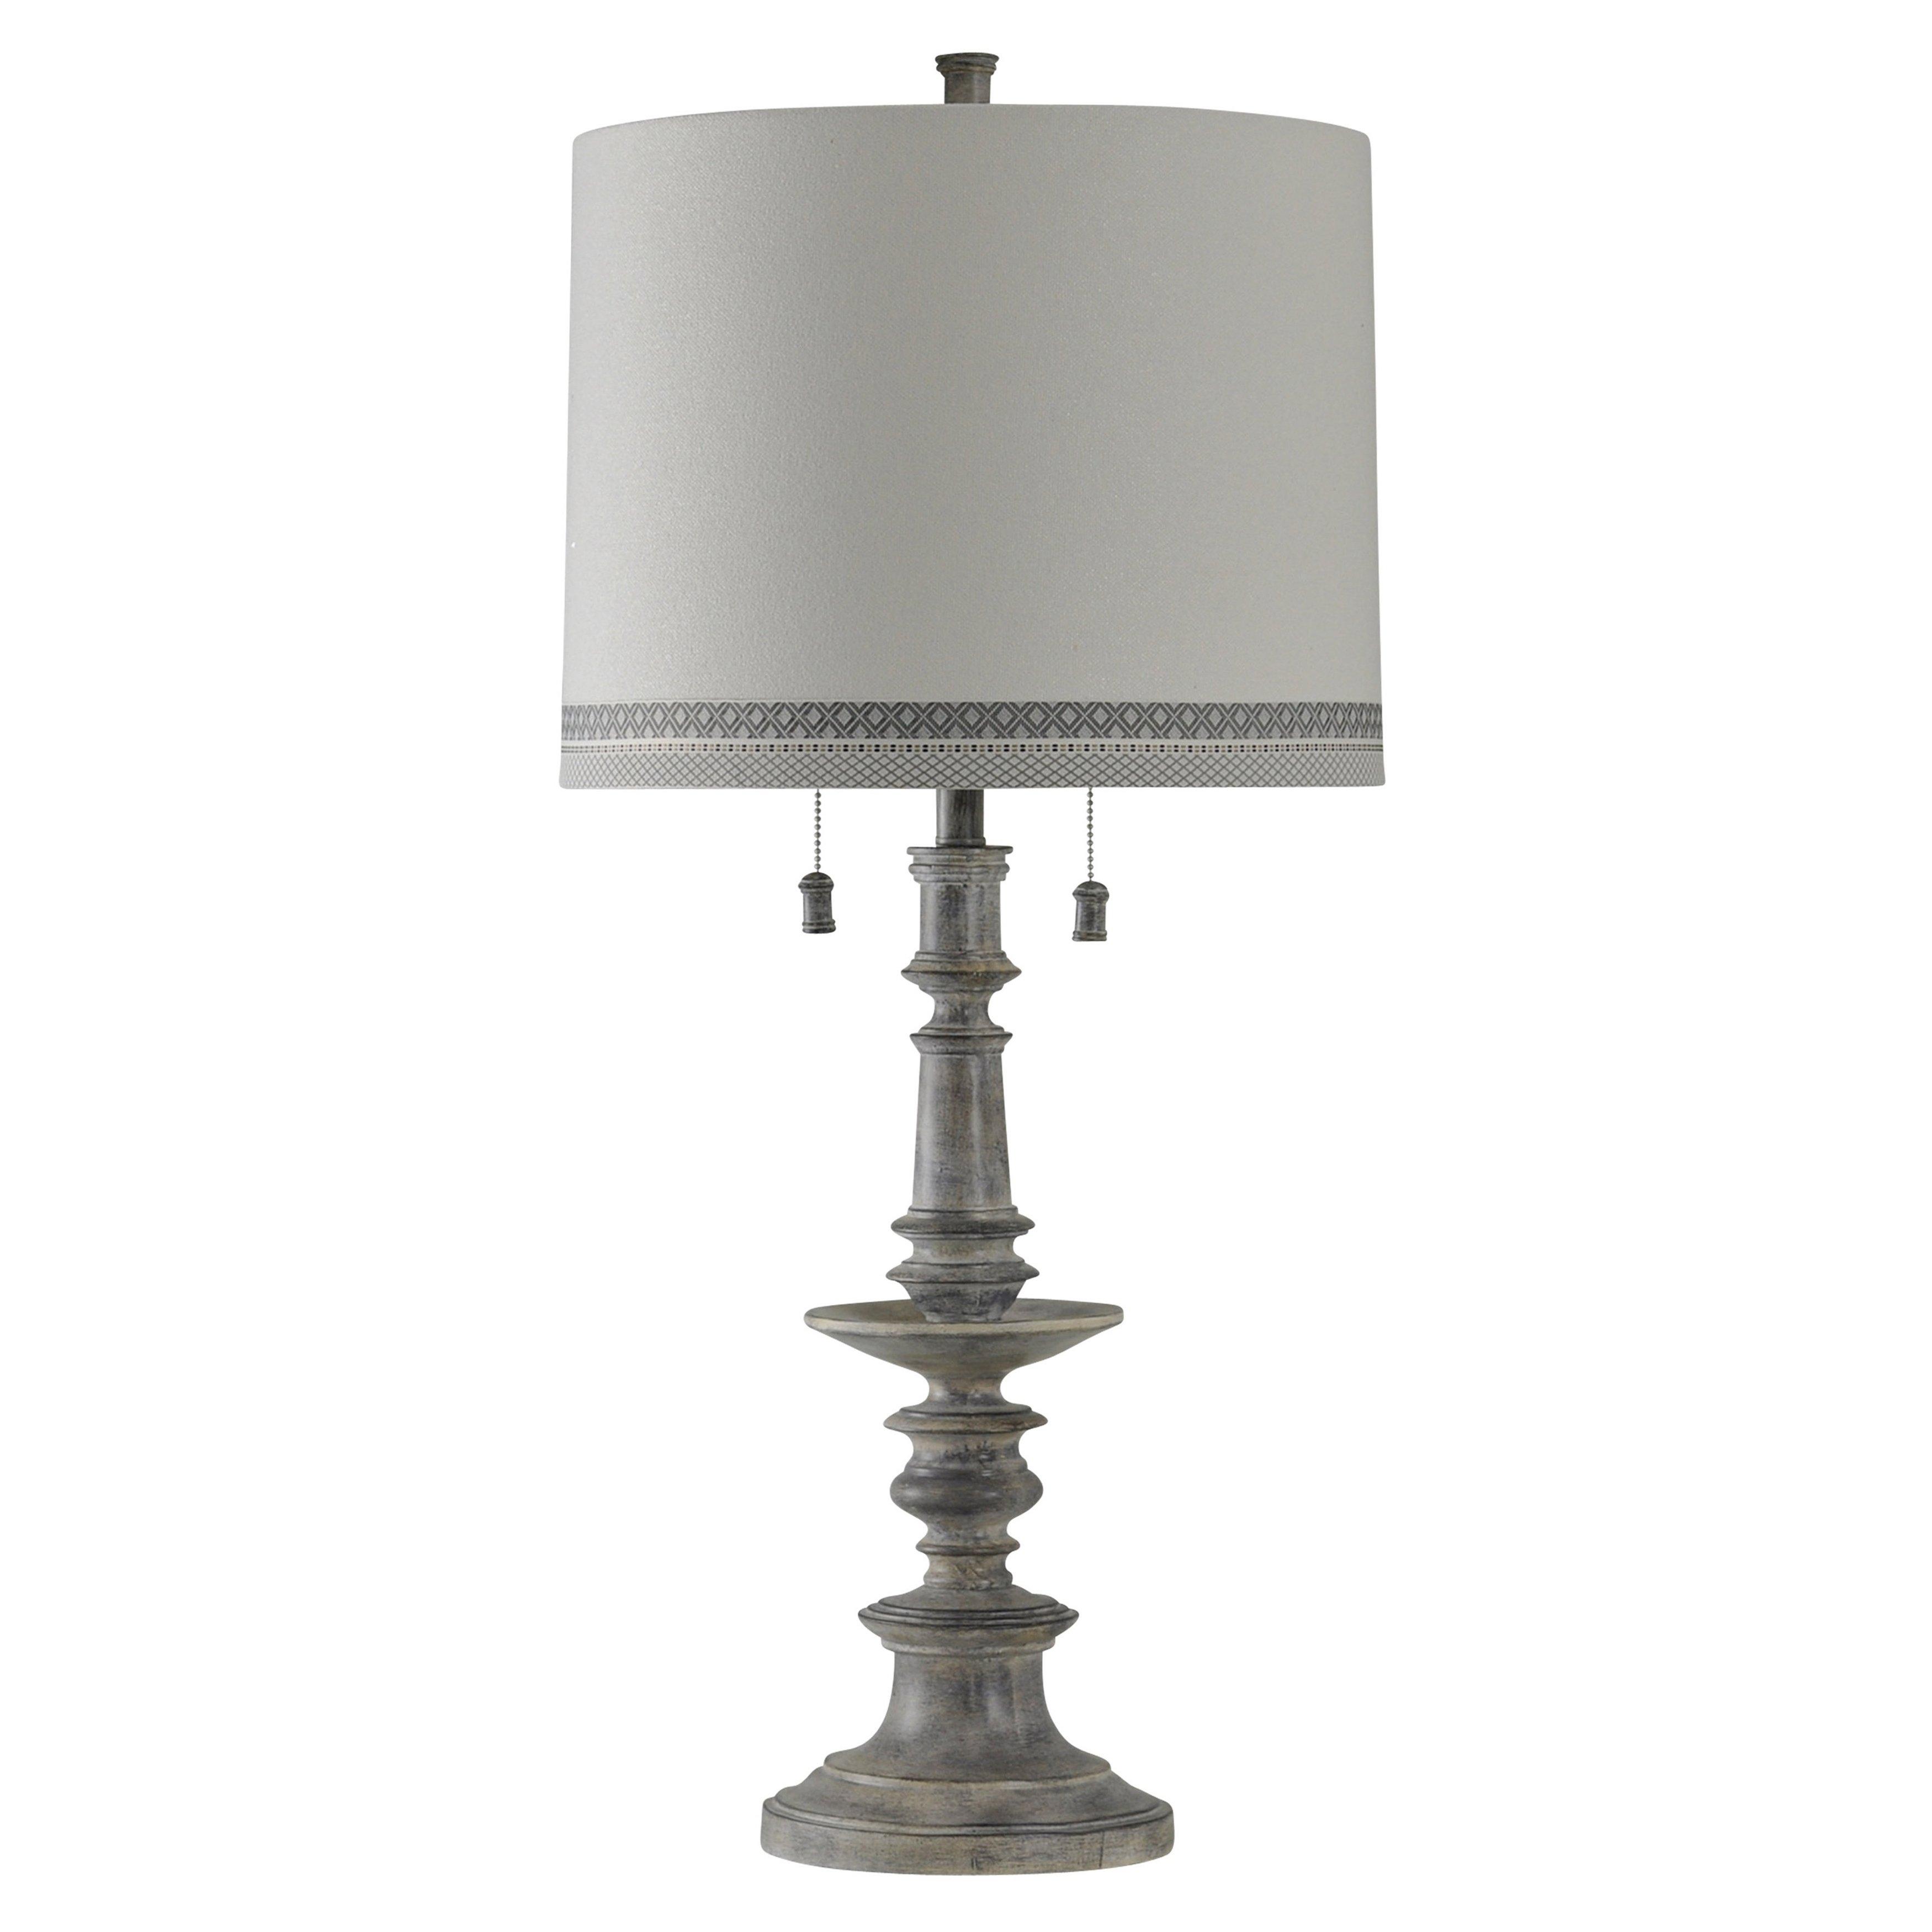 Grayson Washed Gray Table Lamp White Hardback Fabric